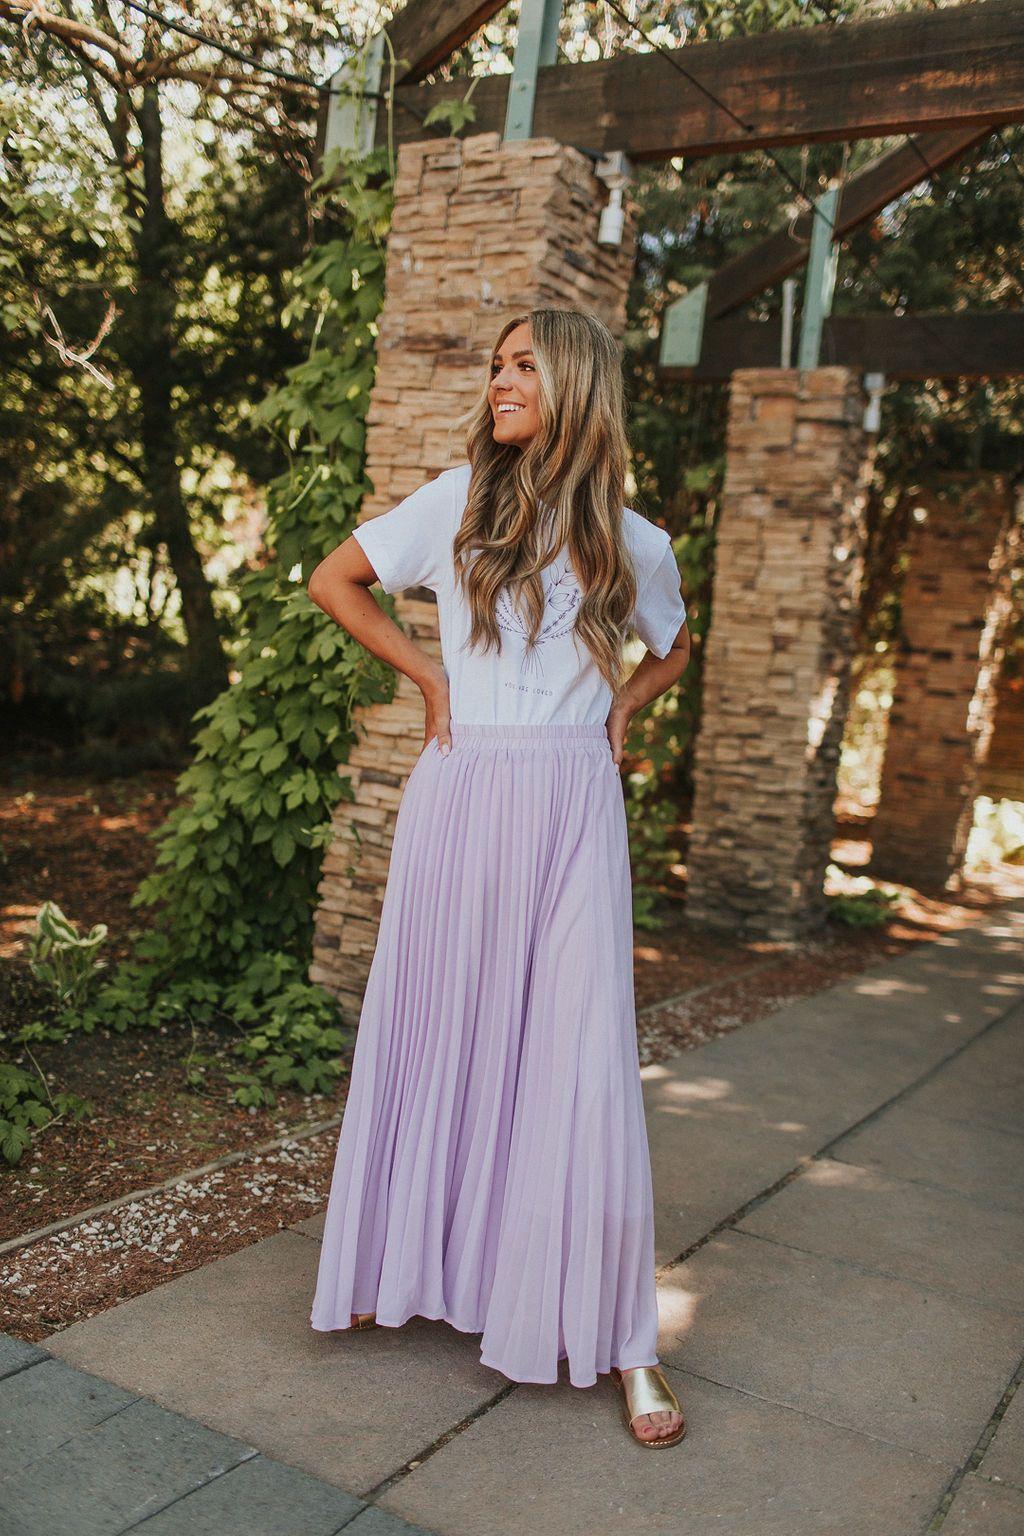 Summer Skirt Style Skirt Fashion Summer Skirts Wedding Dress Top Styles [ 1536 x 1024 Pixel ]